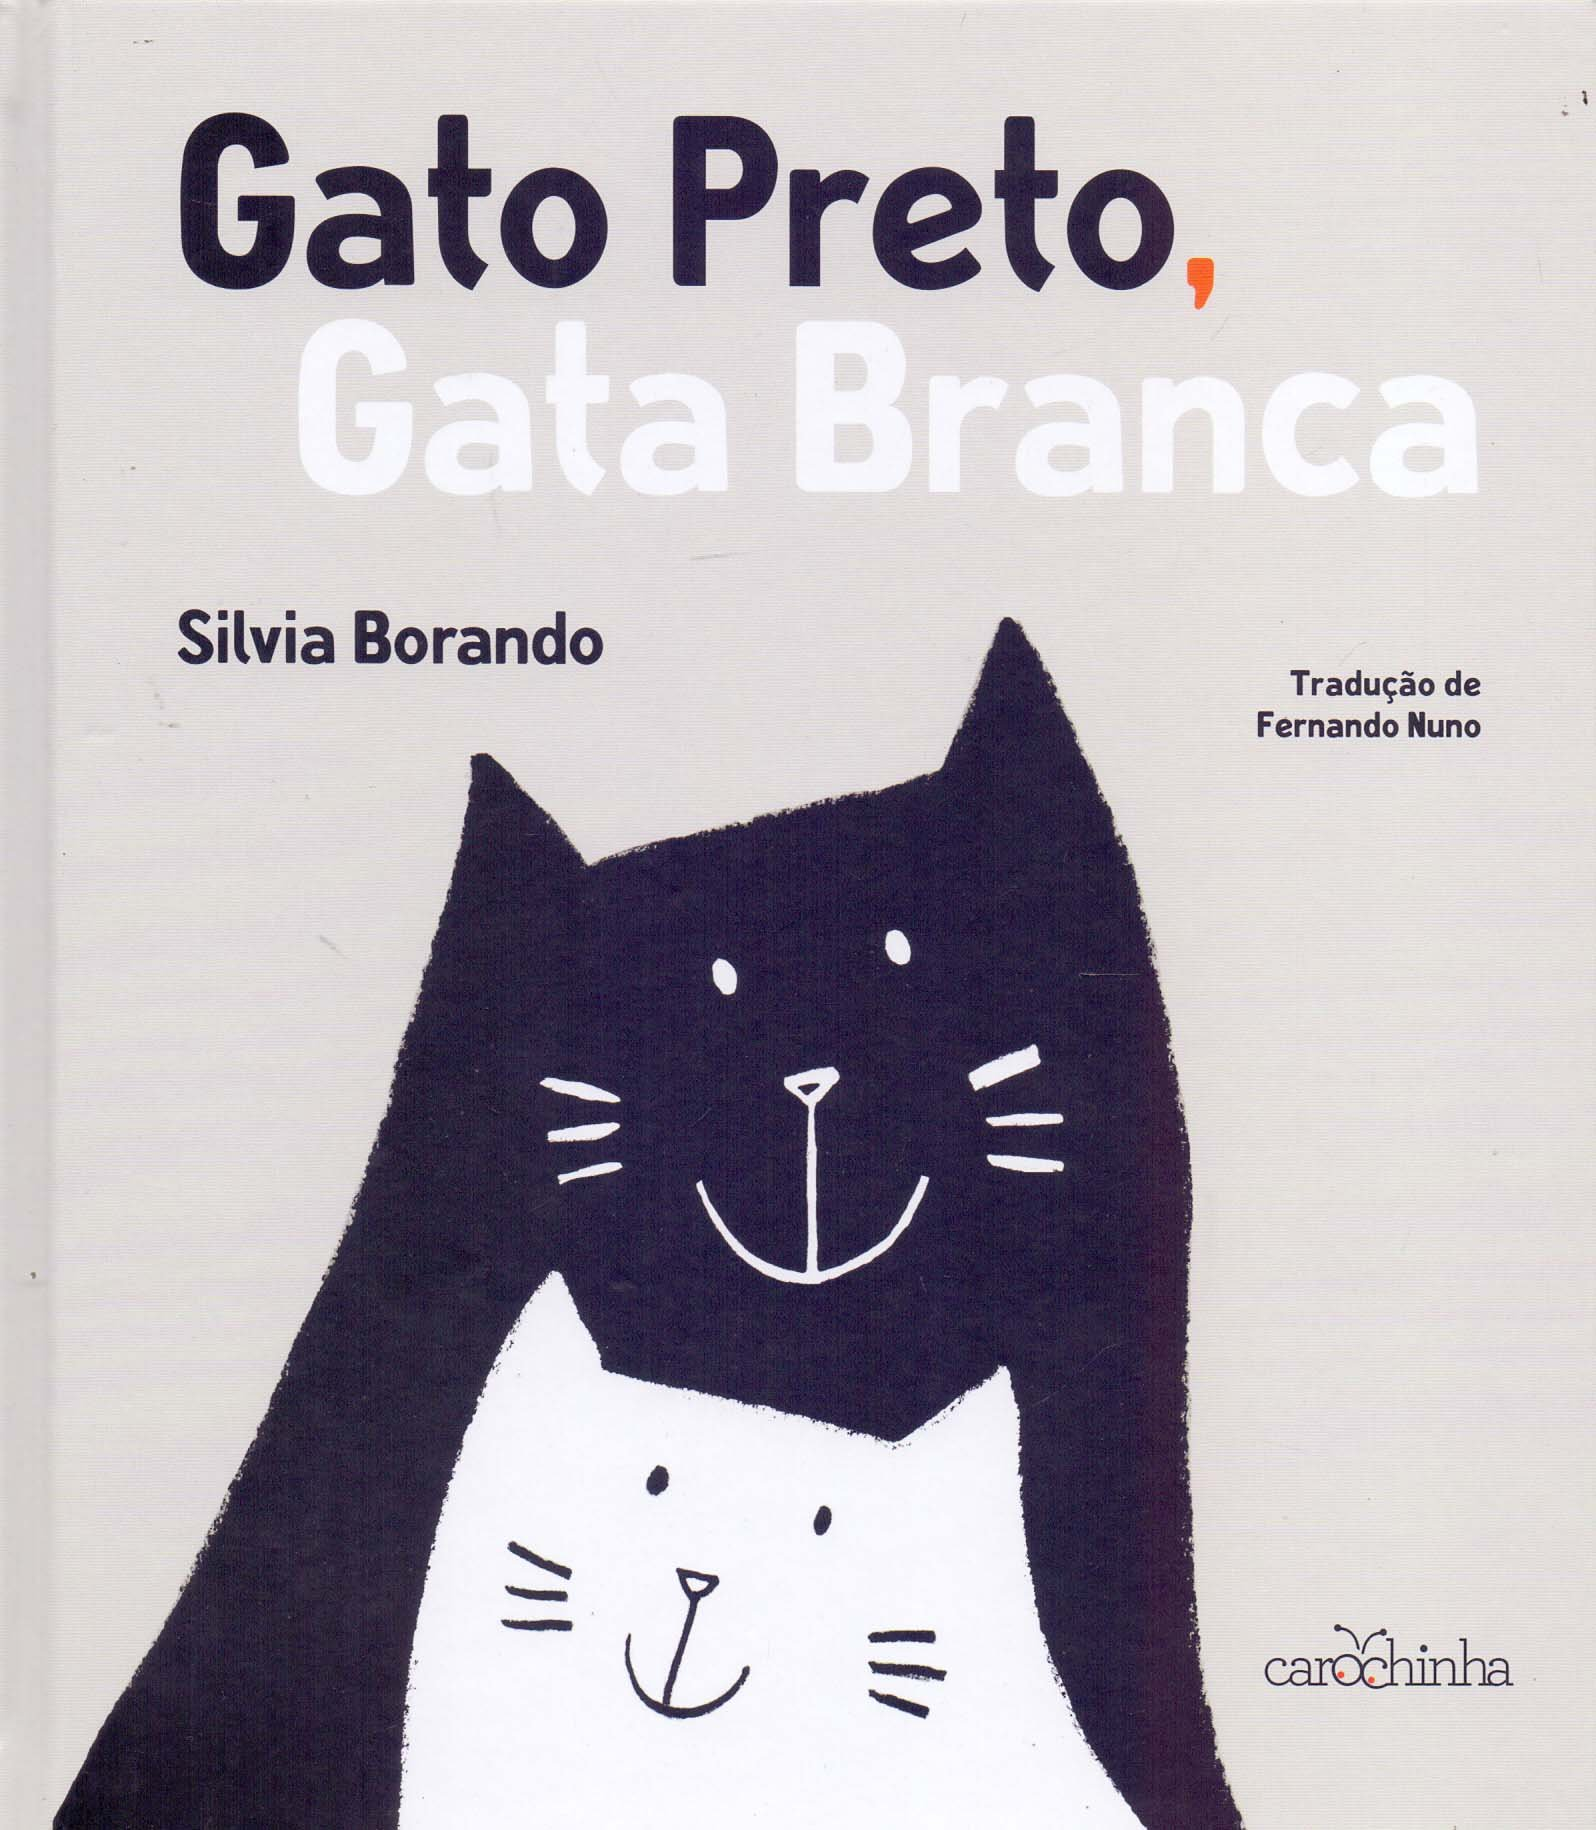 Gato Preto Gata Branca Silvia Borando 9788595540200